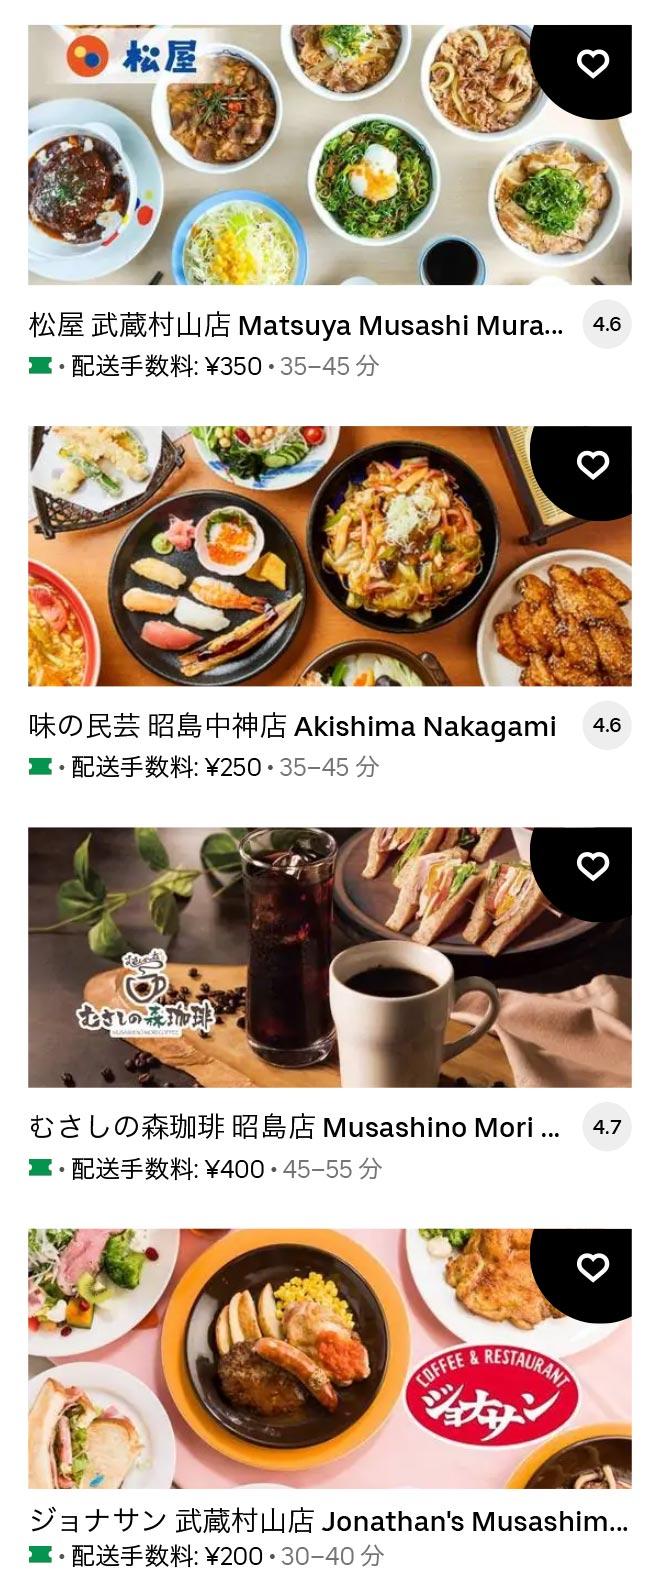 U musashi murayama 2106 06